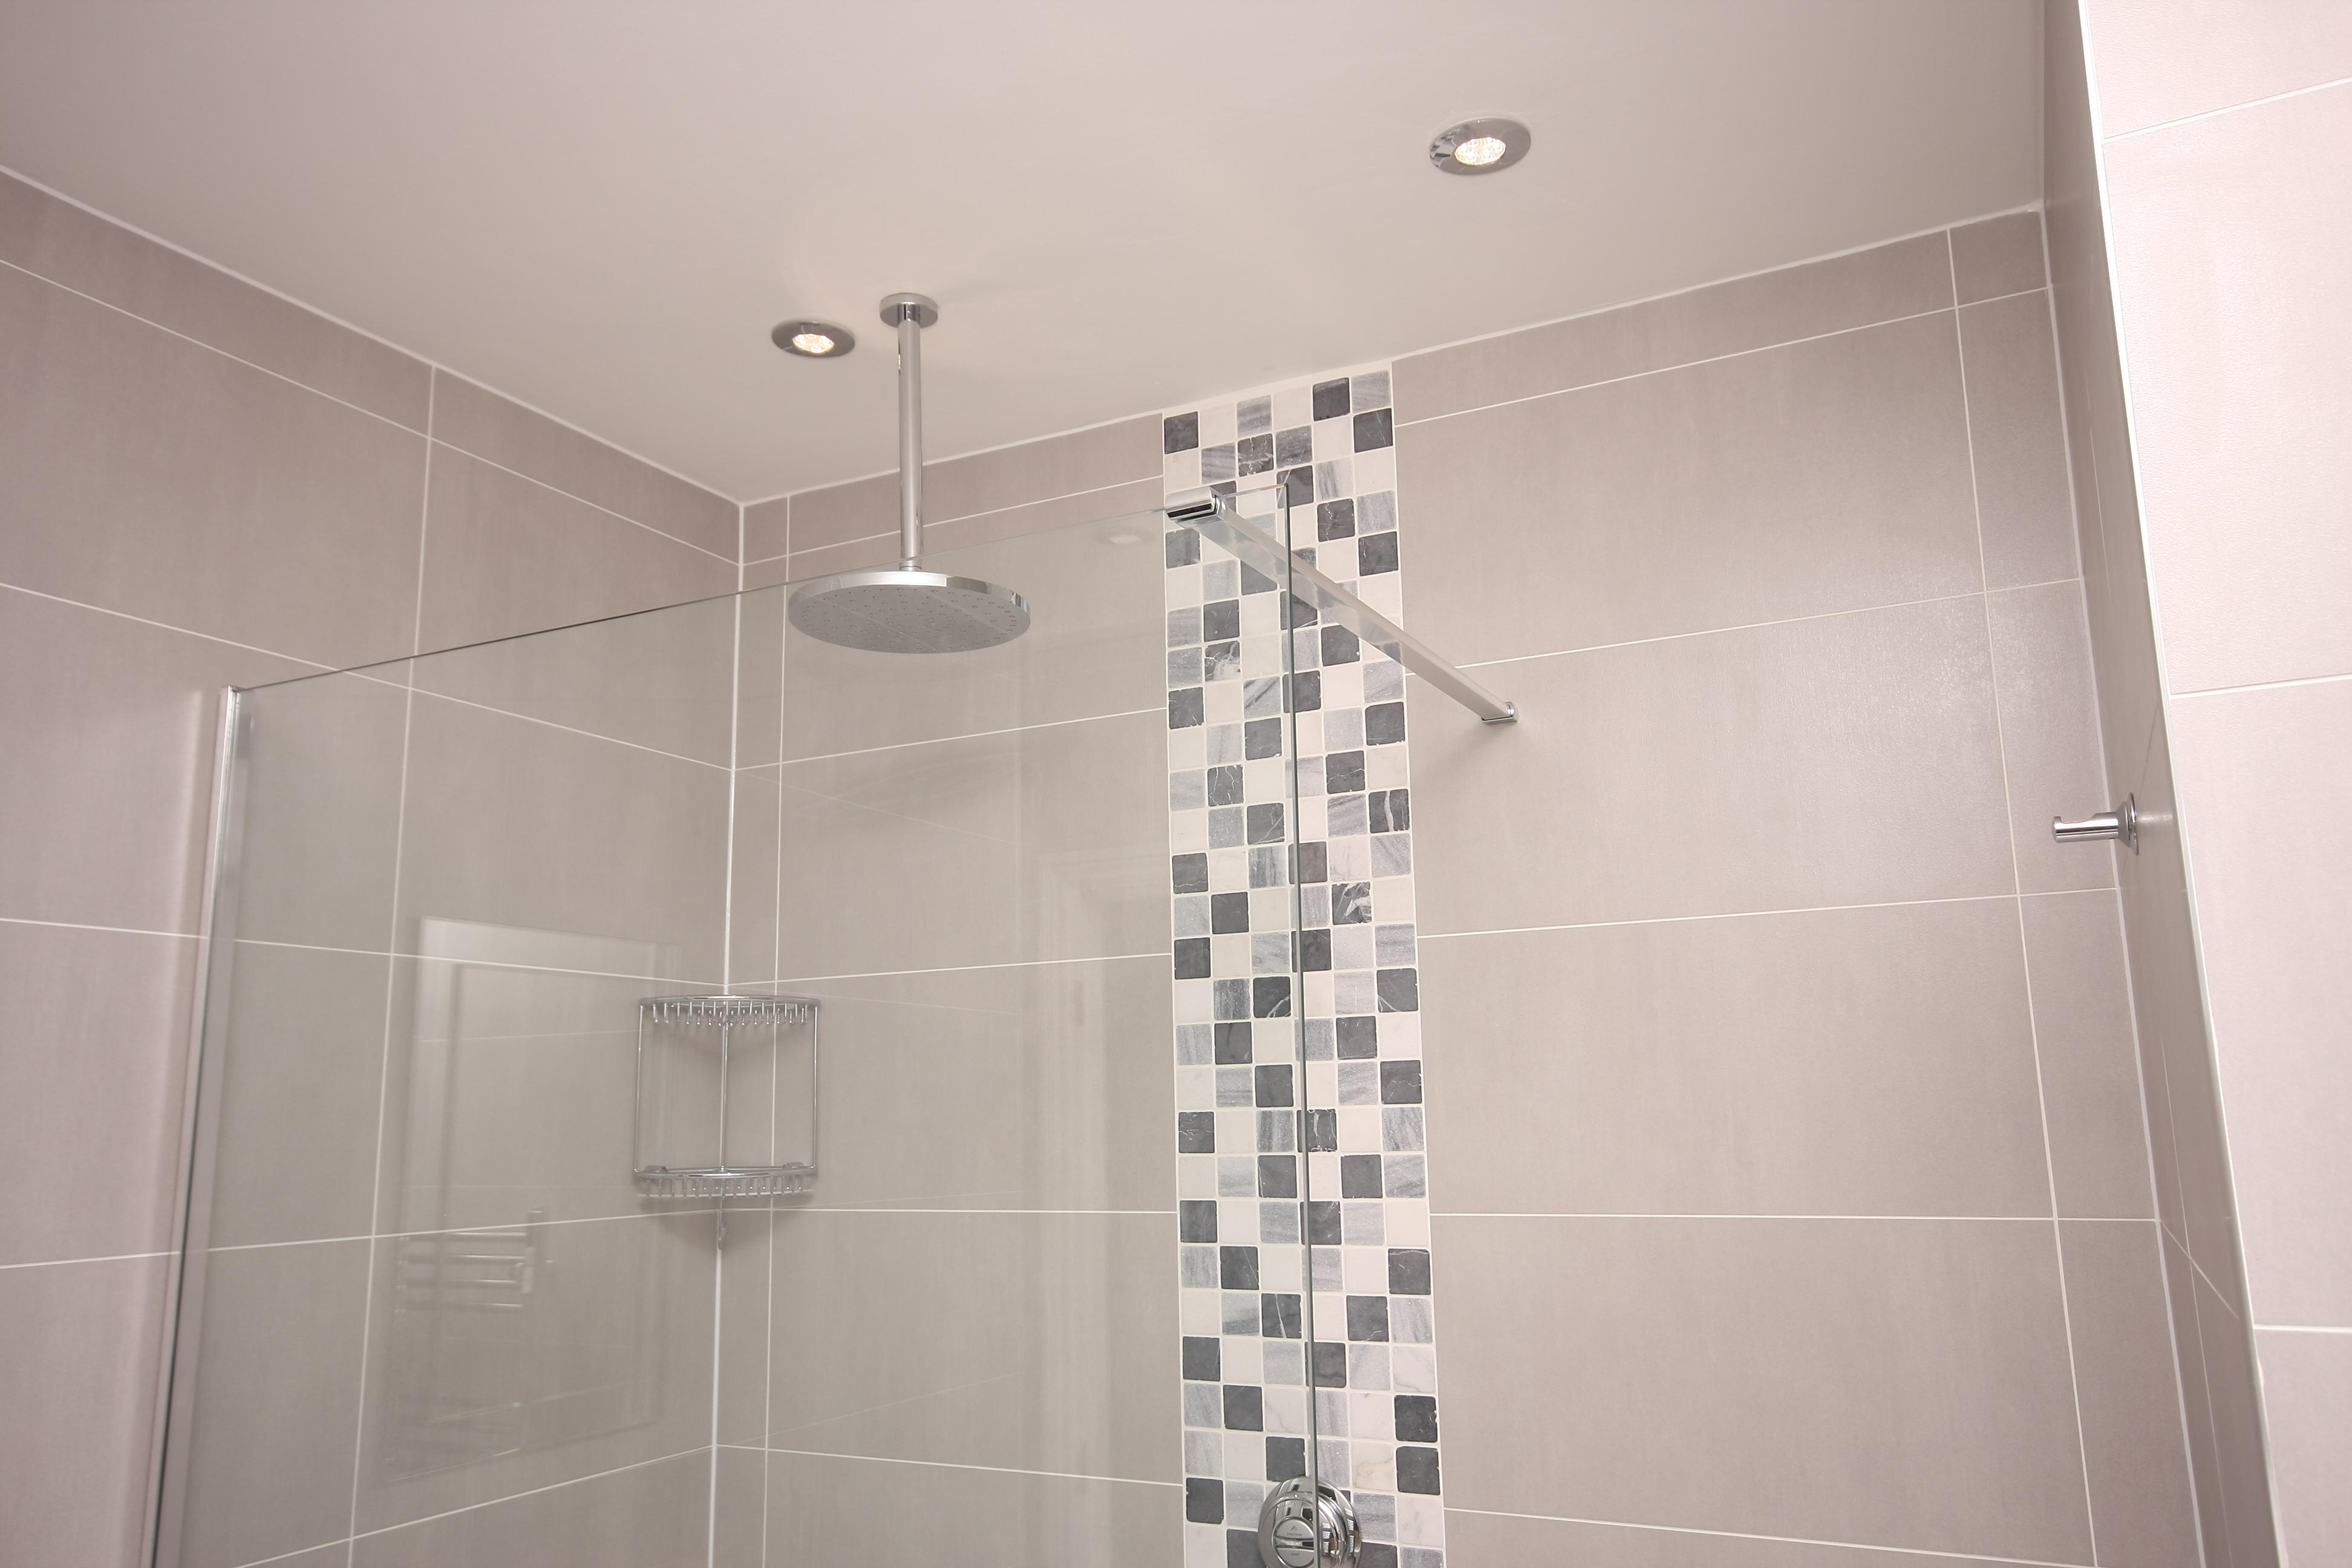 Bathroom ceiling rose